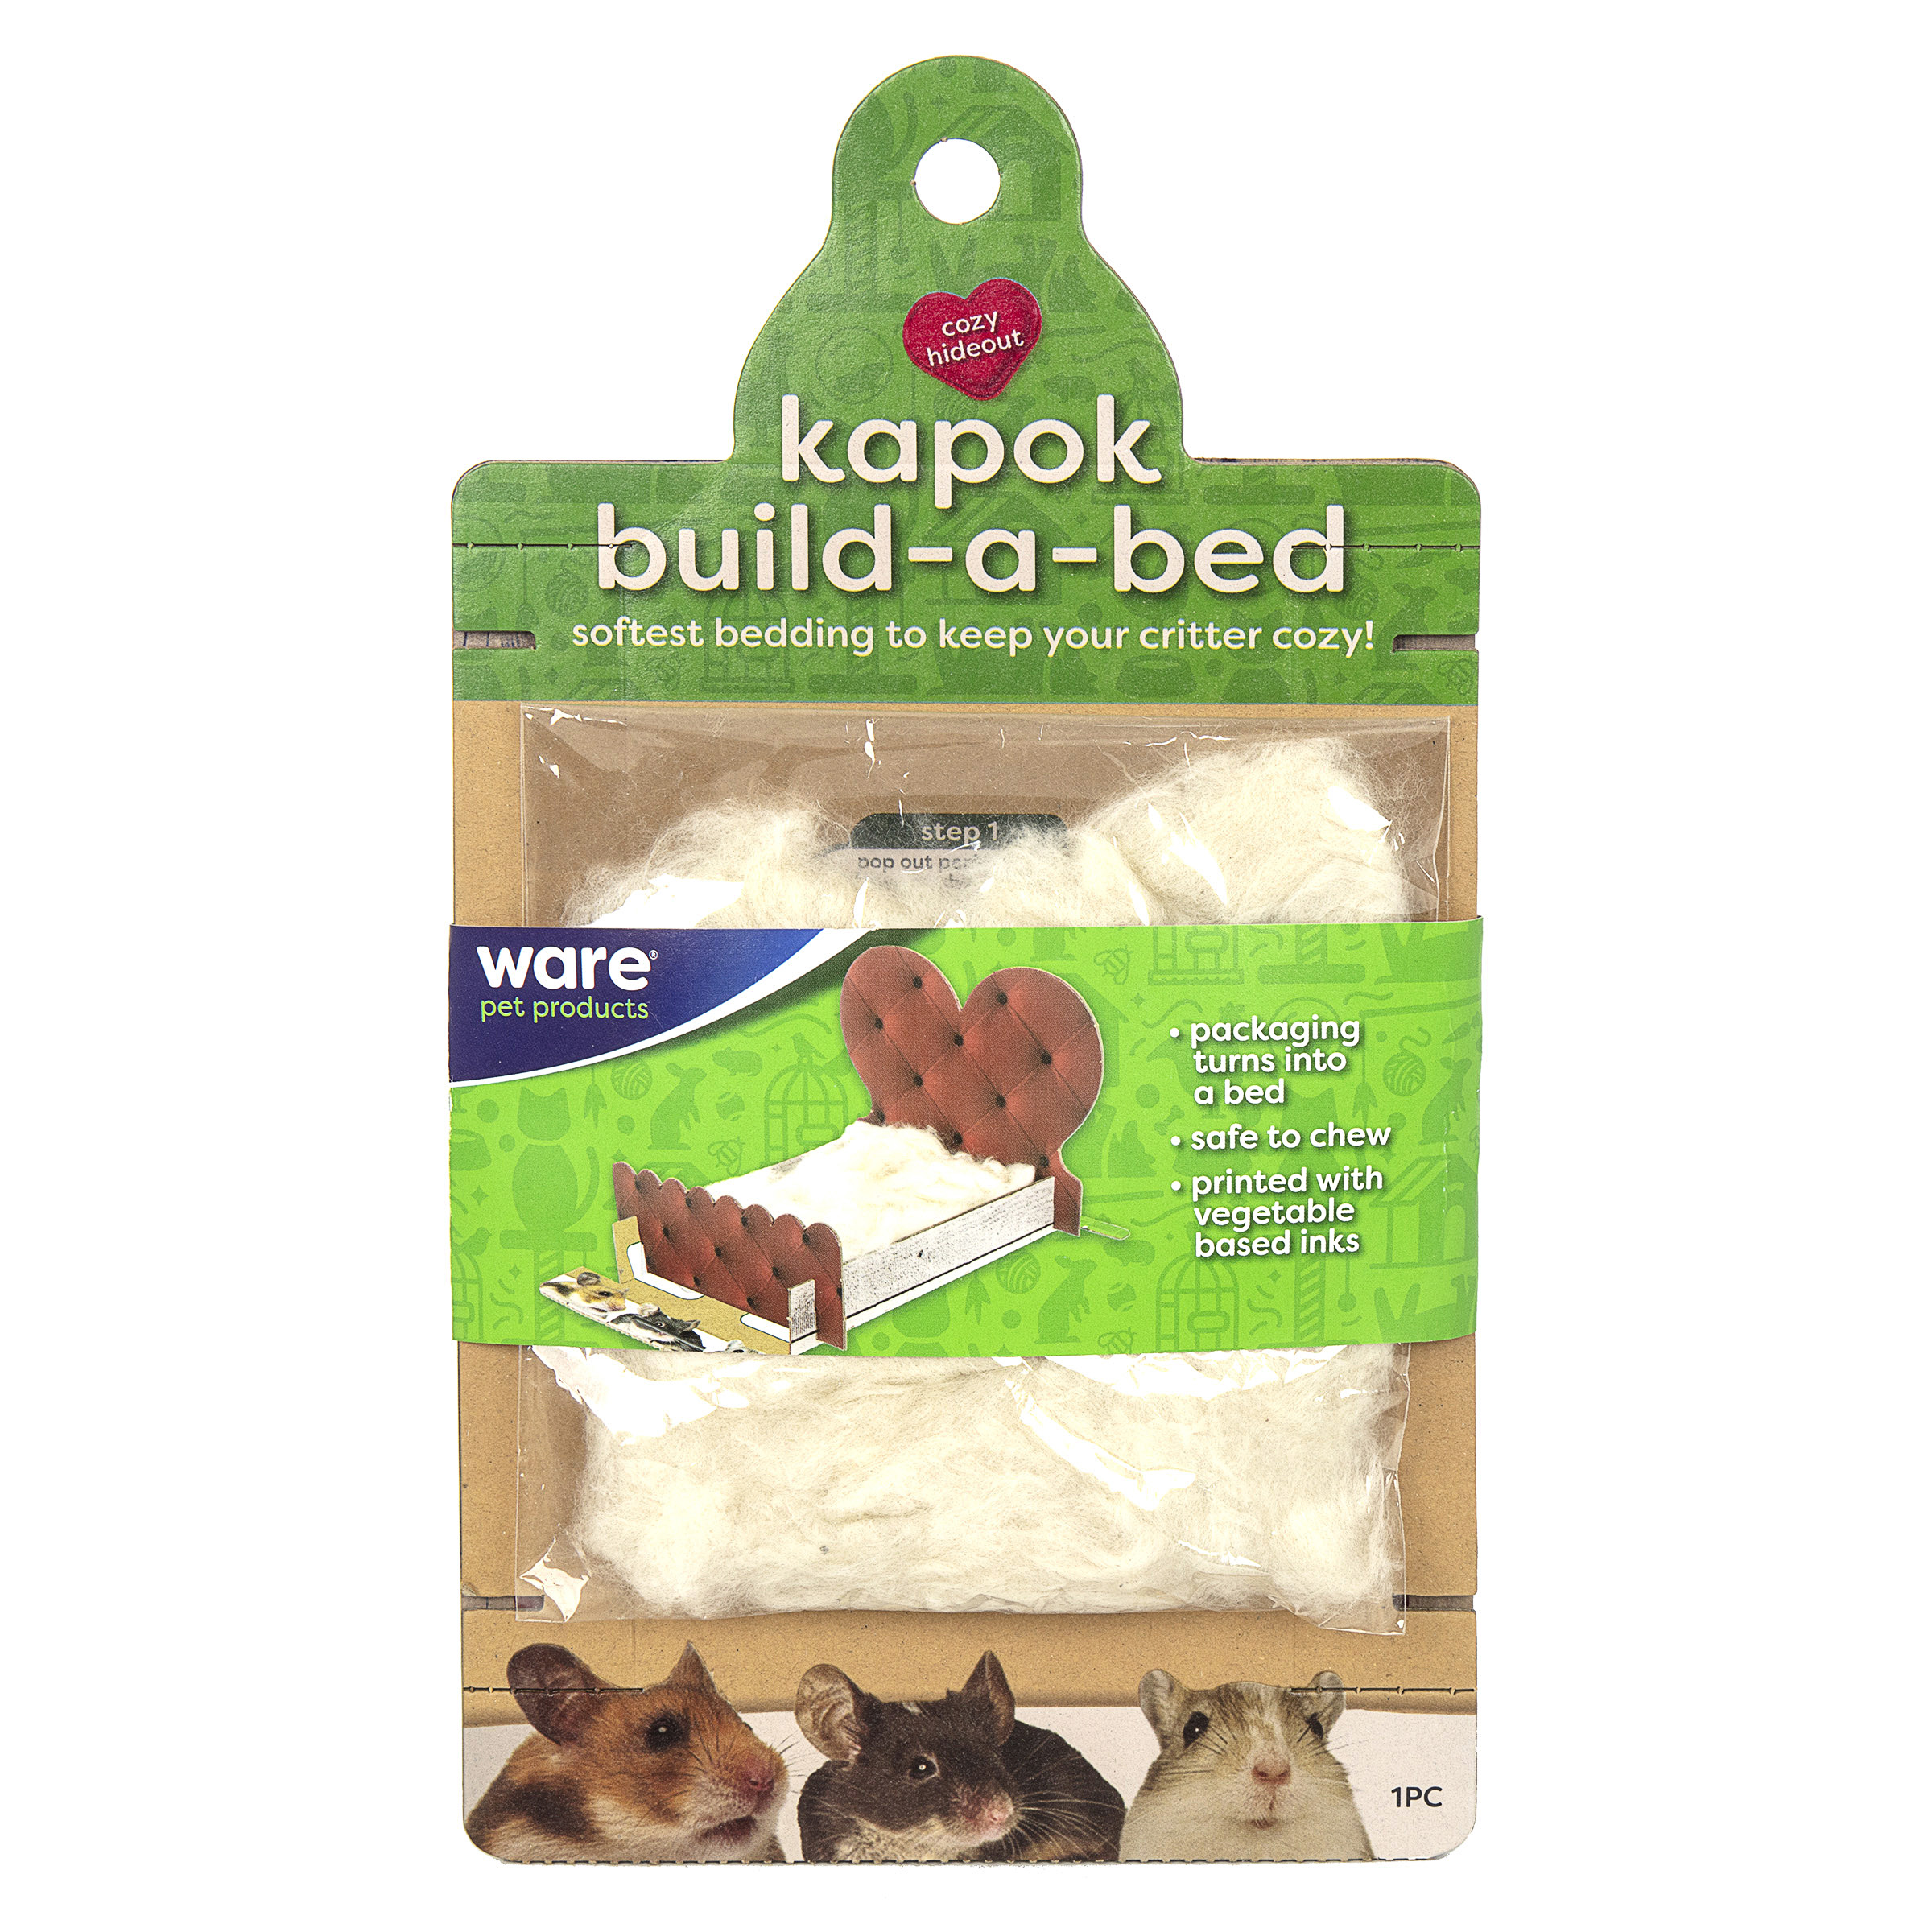 Kapok Build-A-Bed